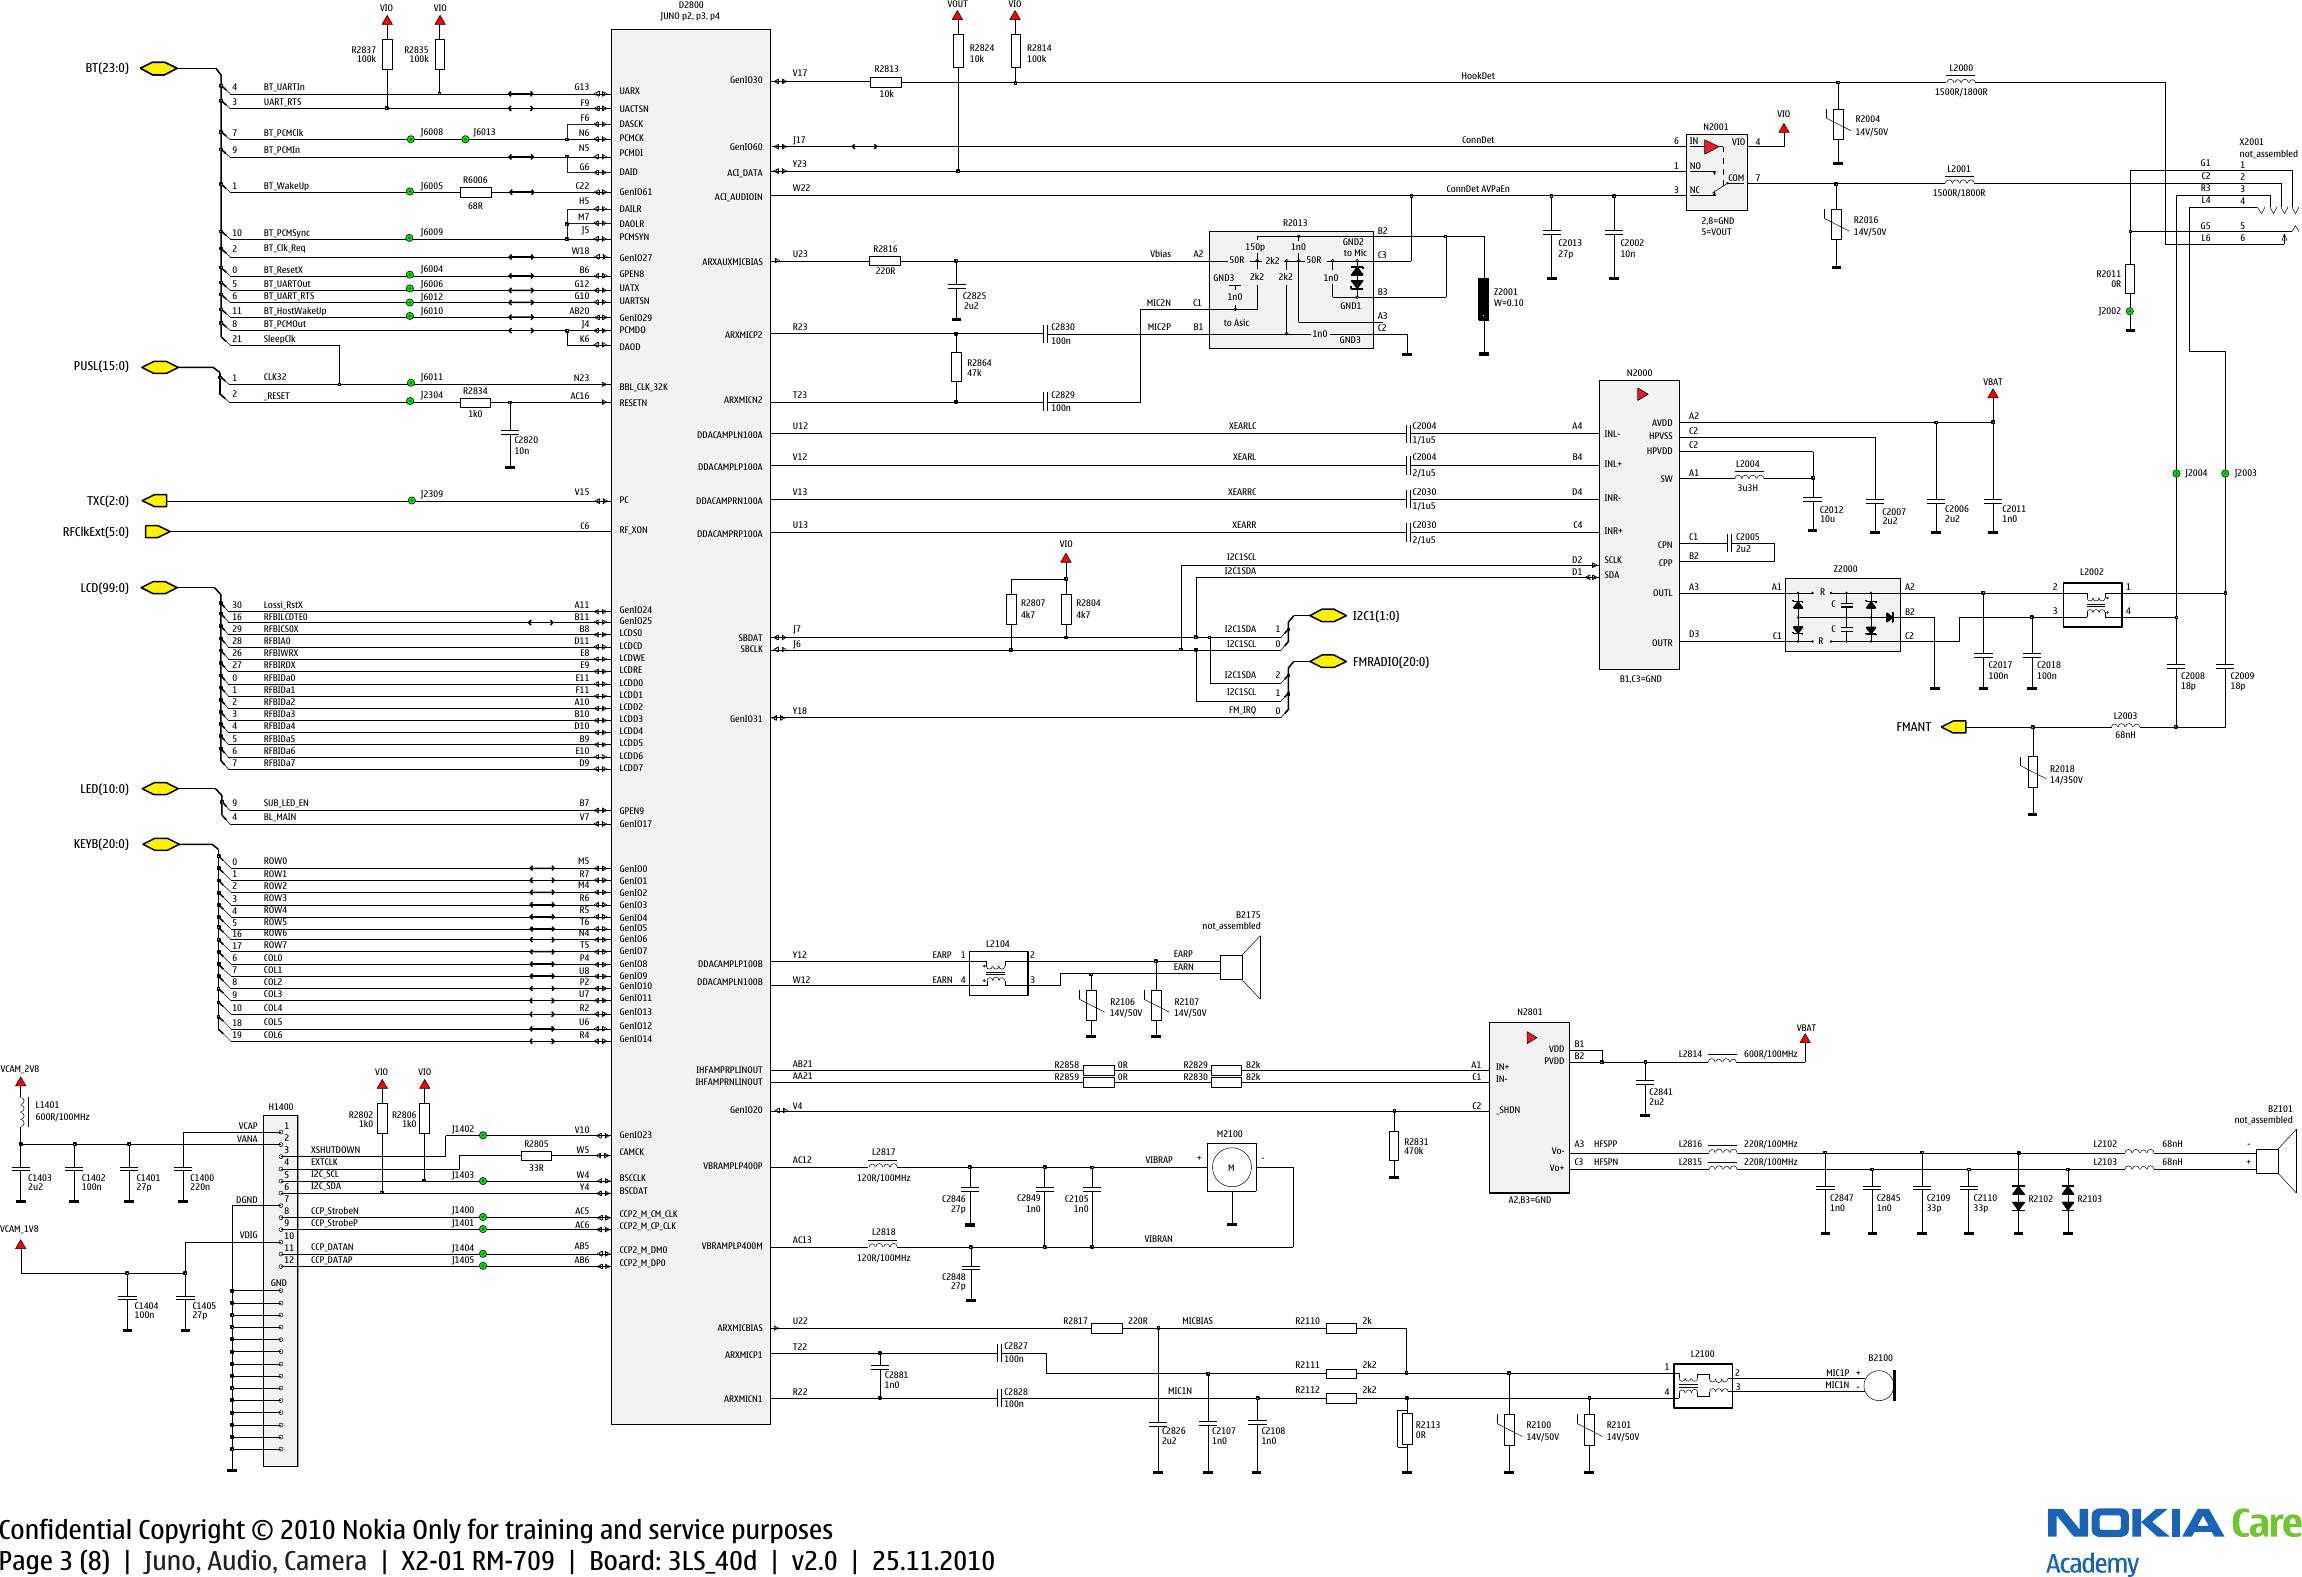 page 3 of 8 - nokia x2-01 rm709 service schematics rm-709 v2